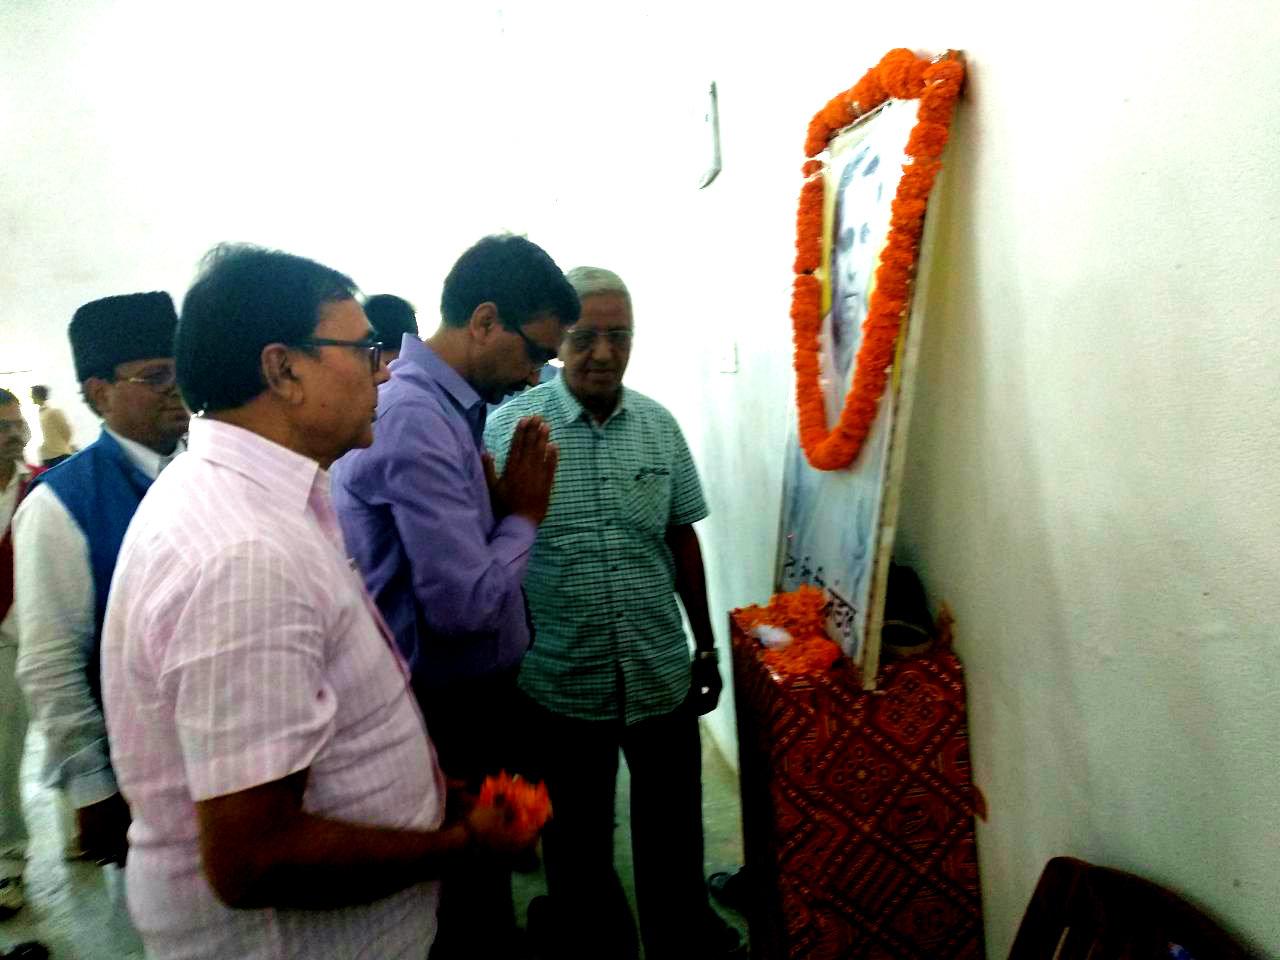 Dr.Madhepuri along with Dynamic DM Md.Sohail , Prof.S.K.Yadav, Md.Shaukat Ali & others giving tributes to Honourable B.P.Mandal at B.P.Mandal Indoor Stadium, Madhepura.